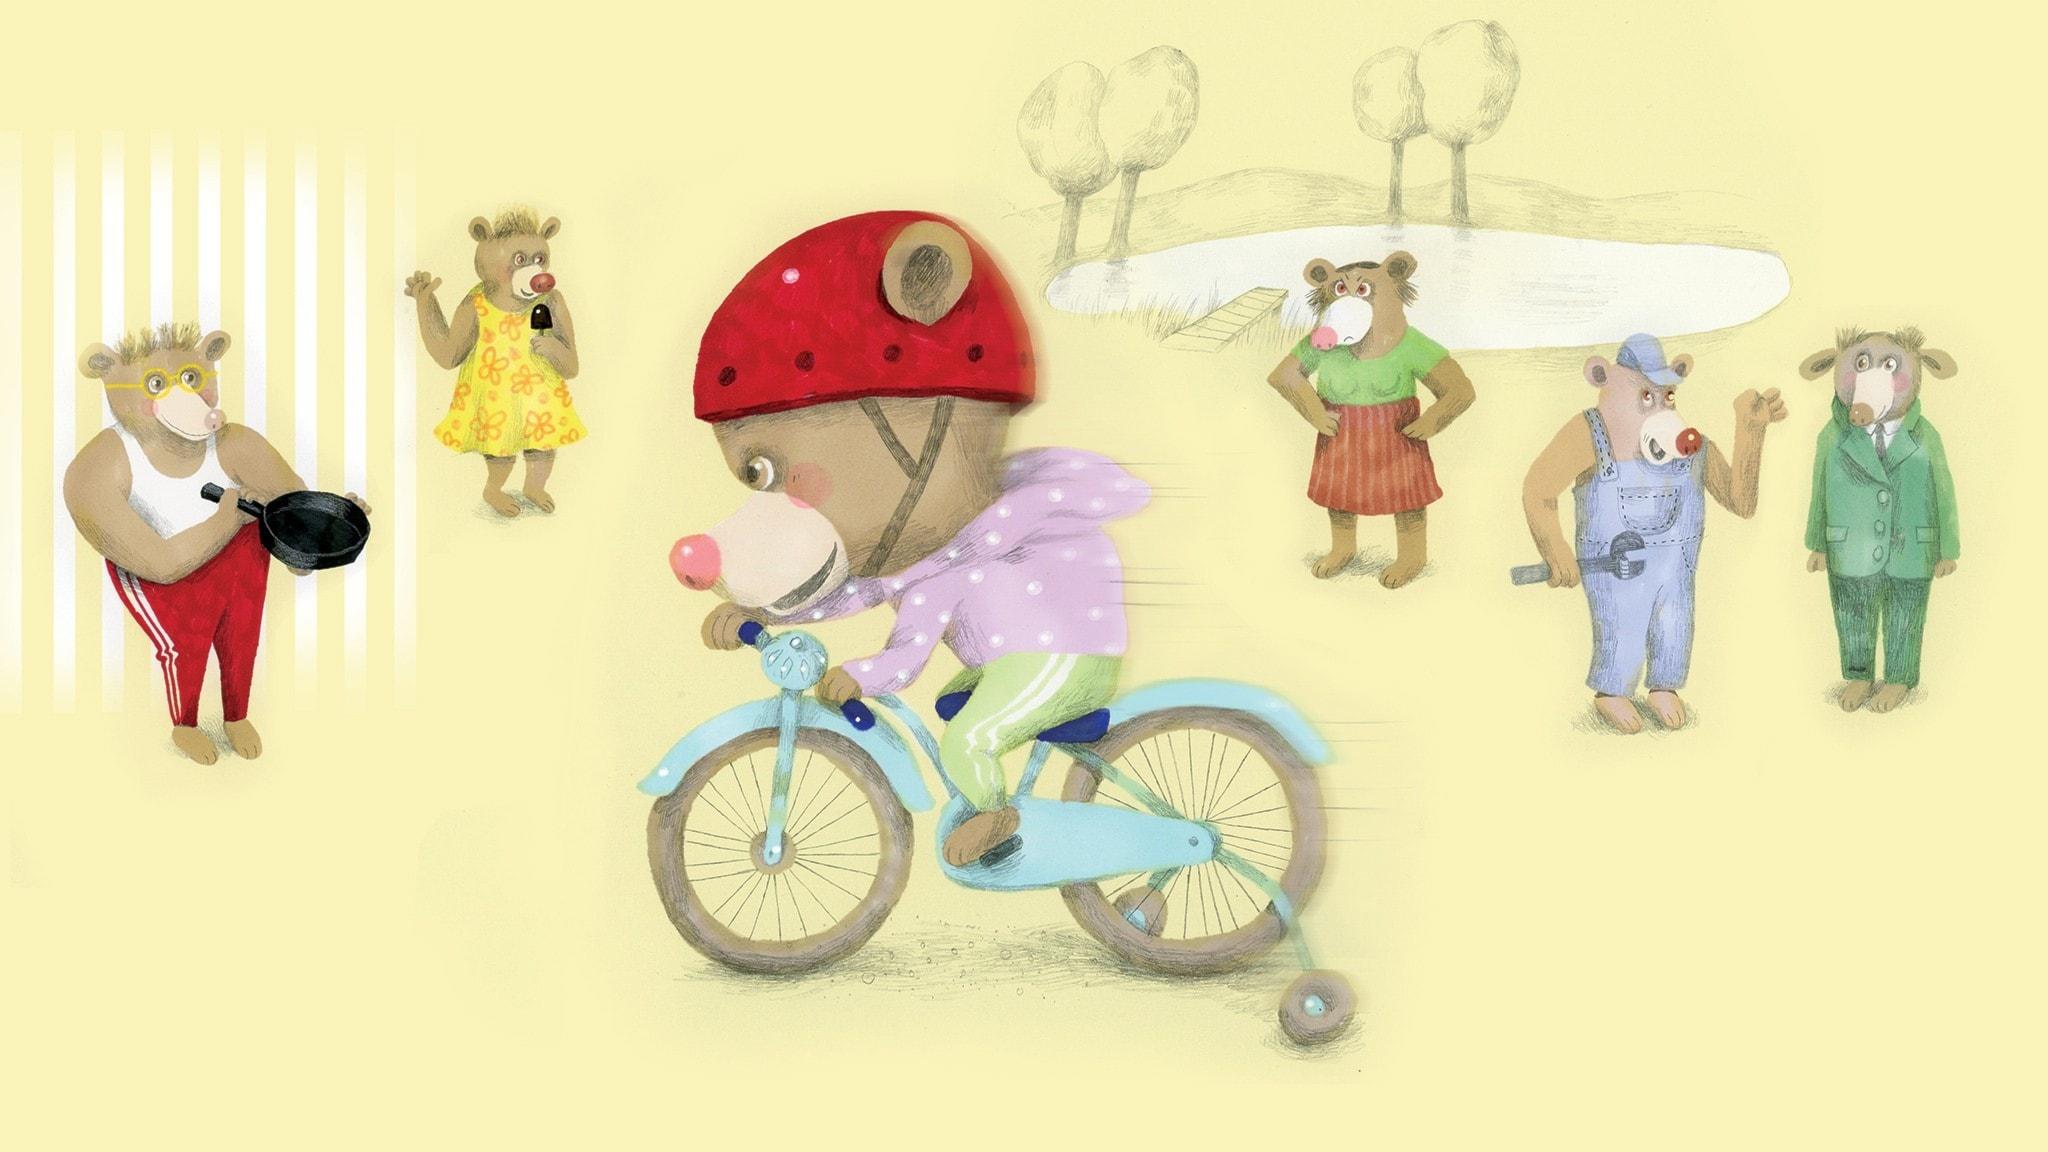 Nalle cyklar snabbt på sin cykel. Illustration: Lotta Geffenblad